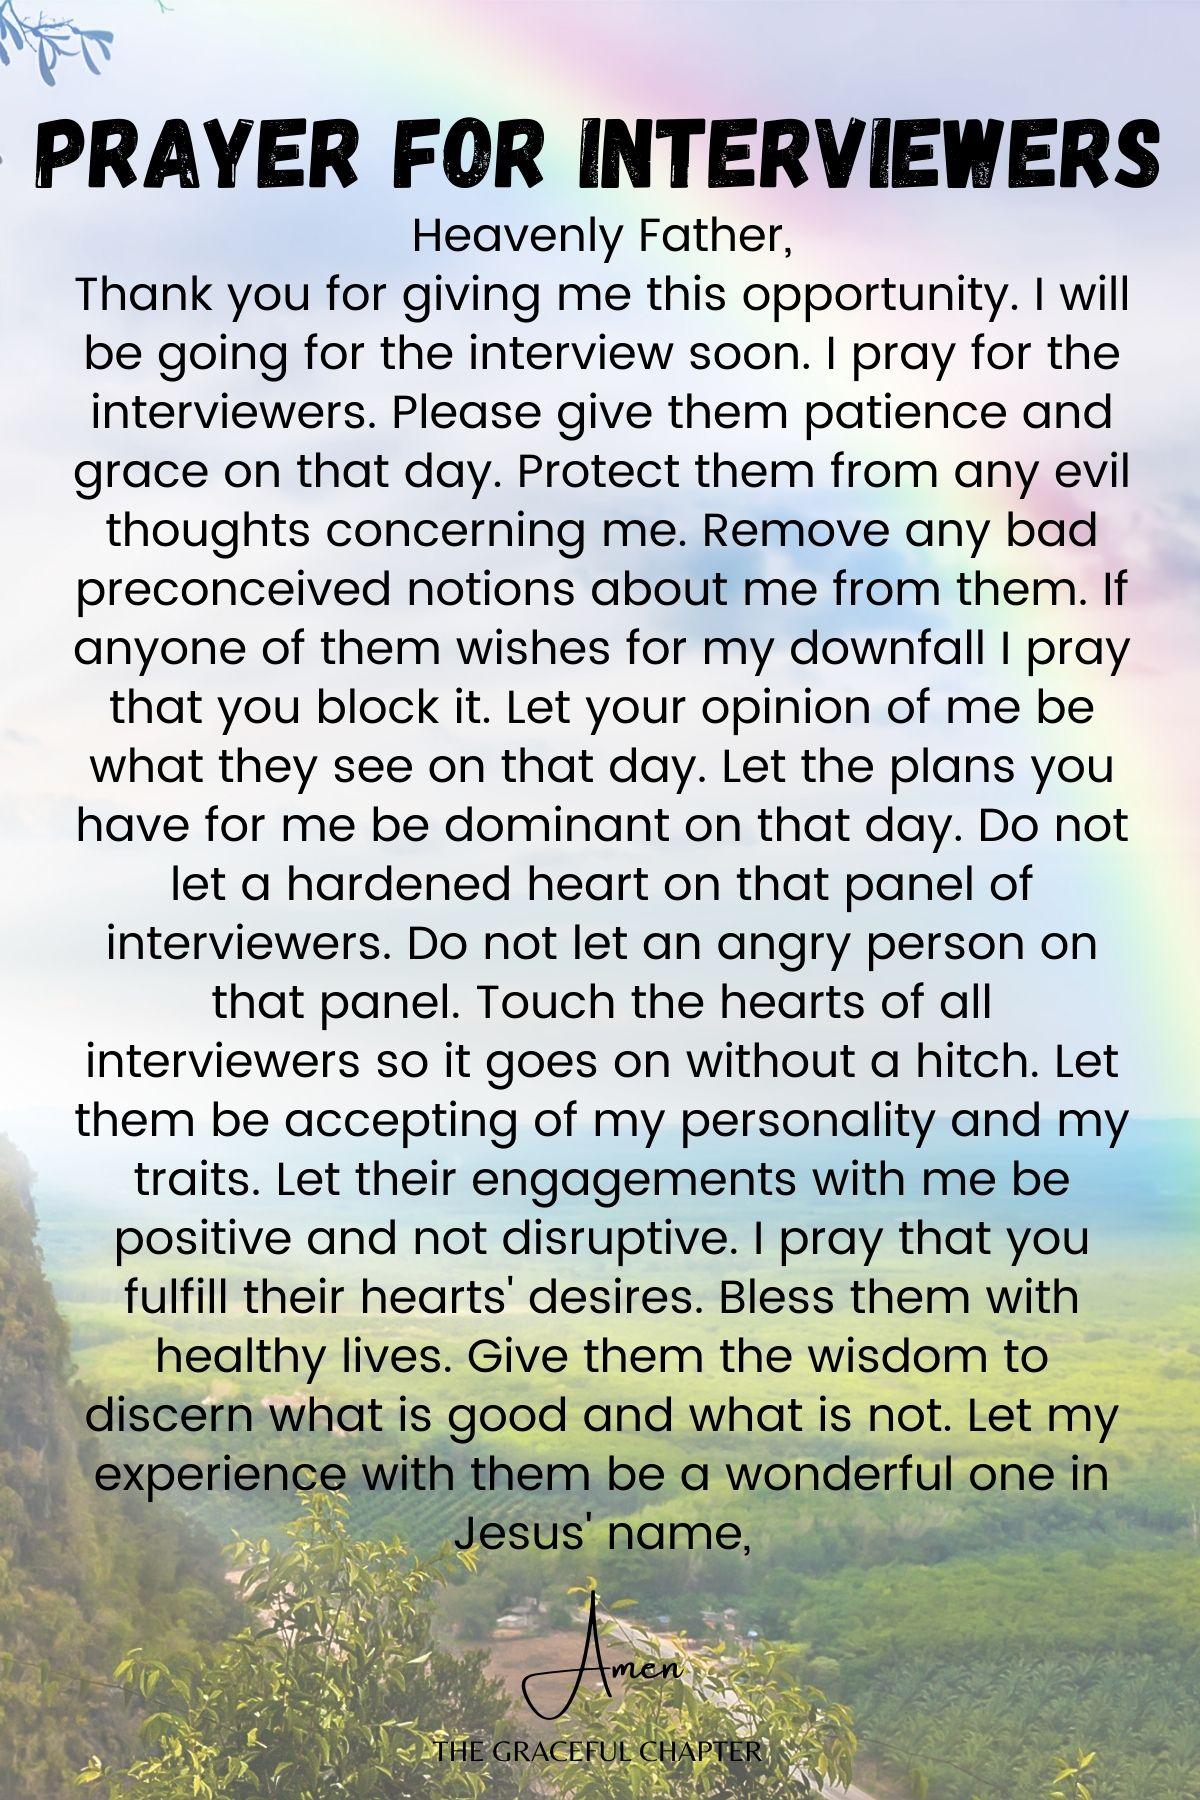 Prayer for interviewers - prayers for job interview